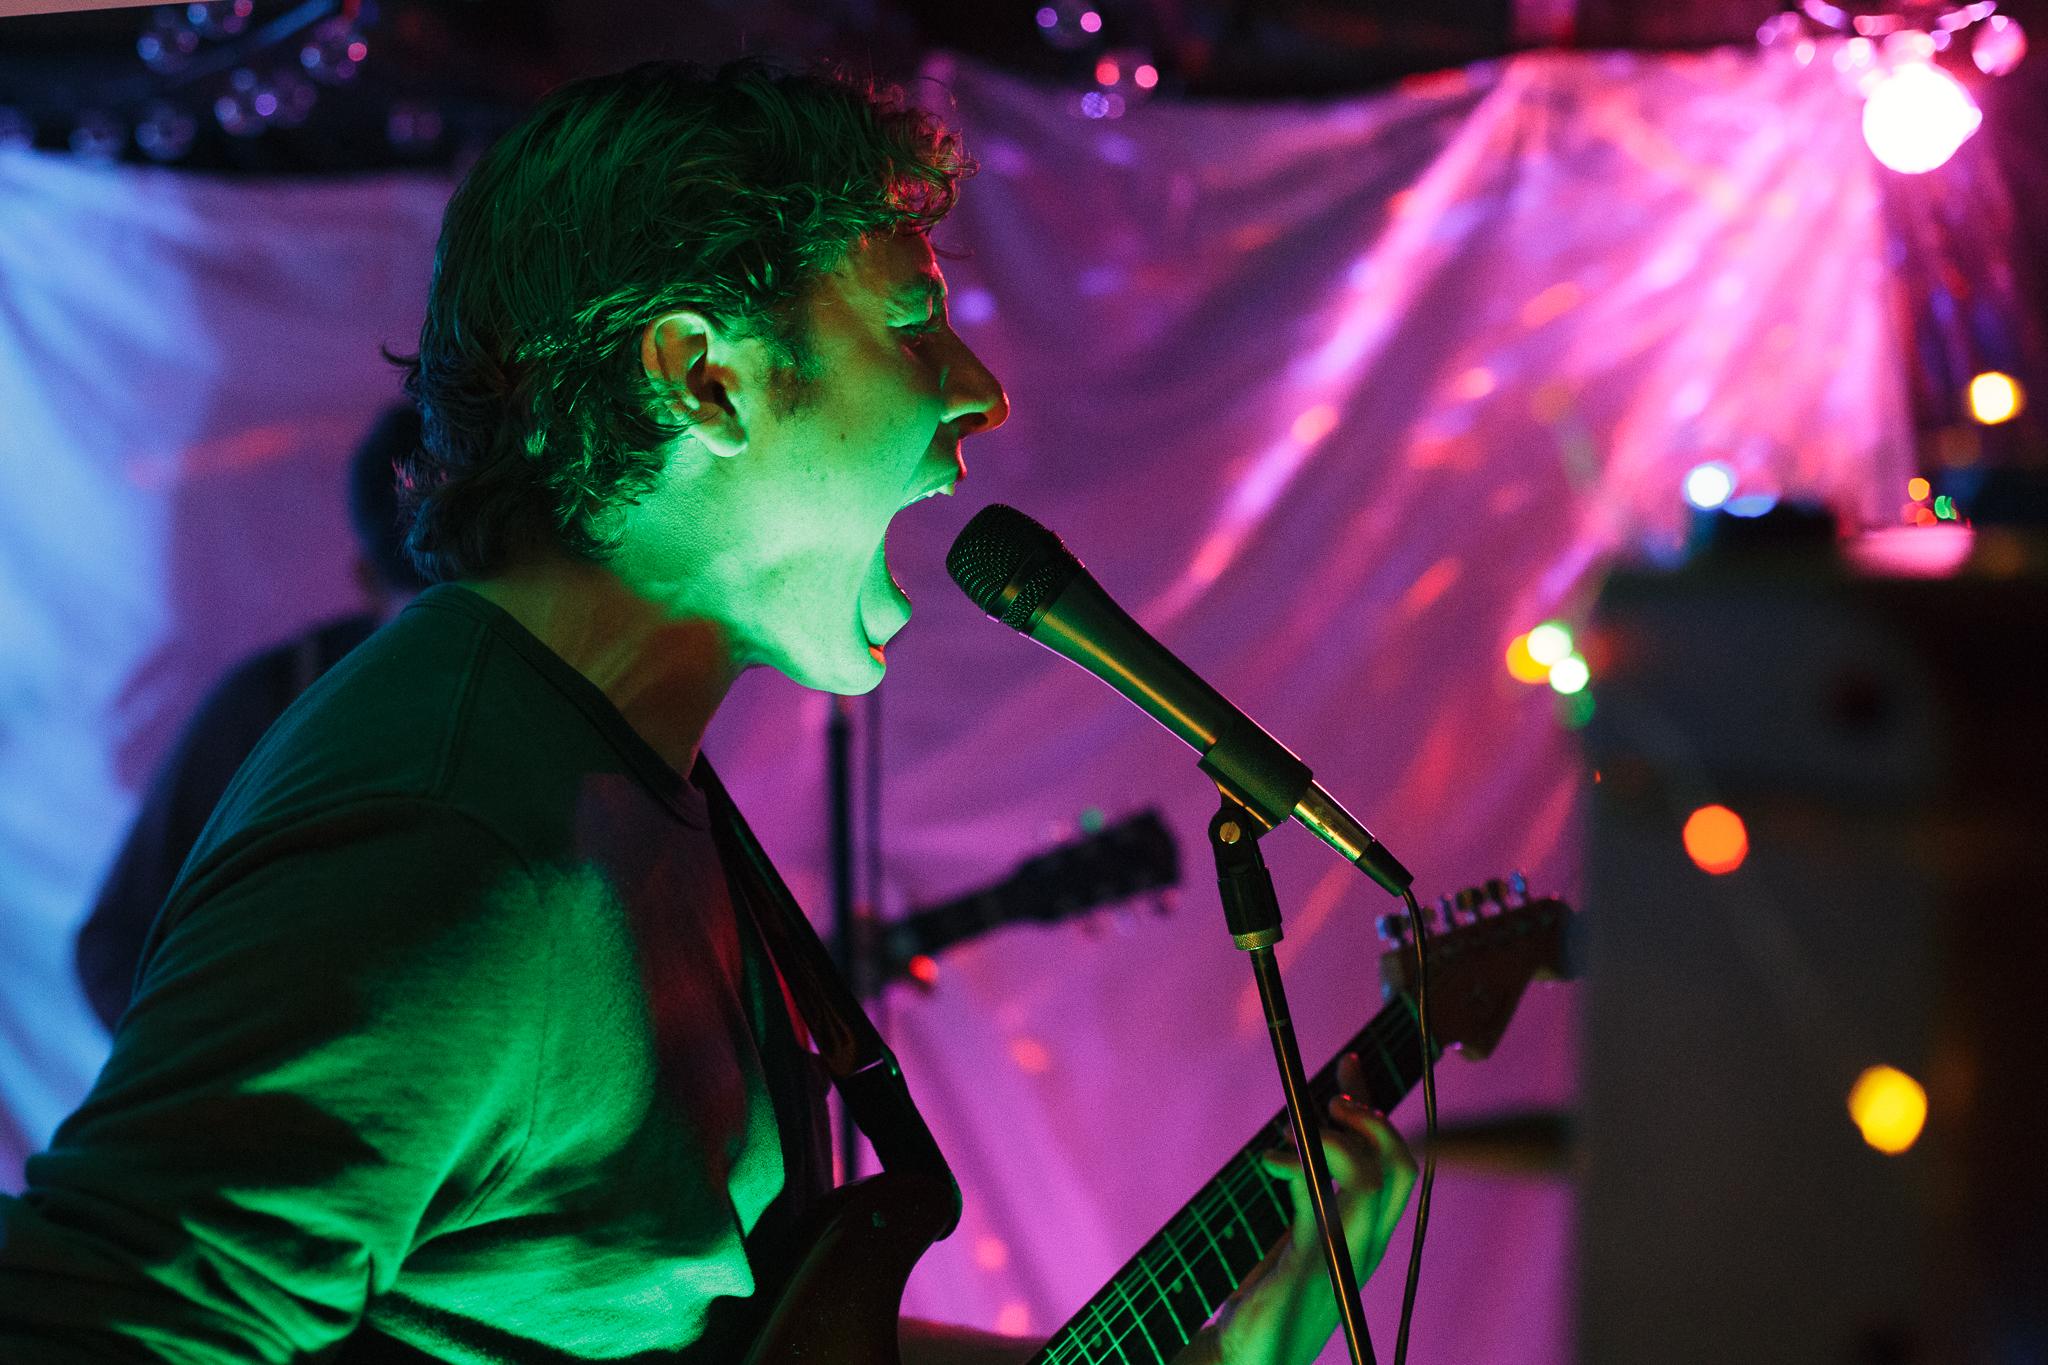 Martha Lights @ OTHERFEELS (Photo by Mauricio Castro /  @themauricio )